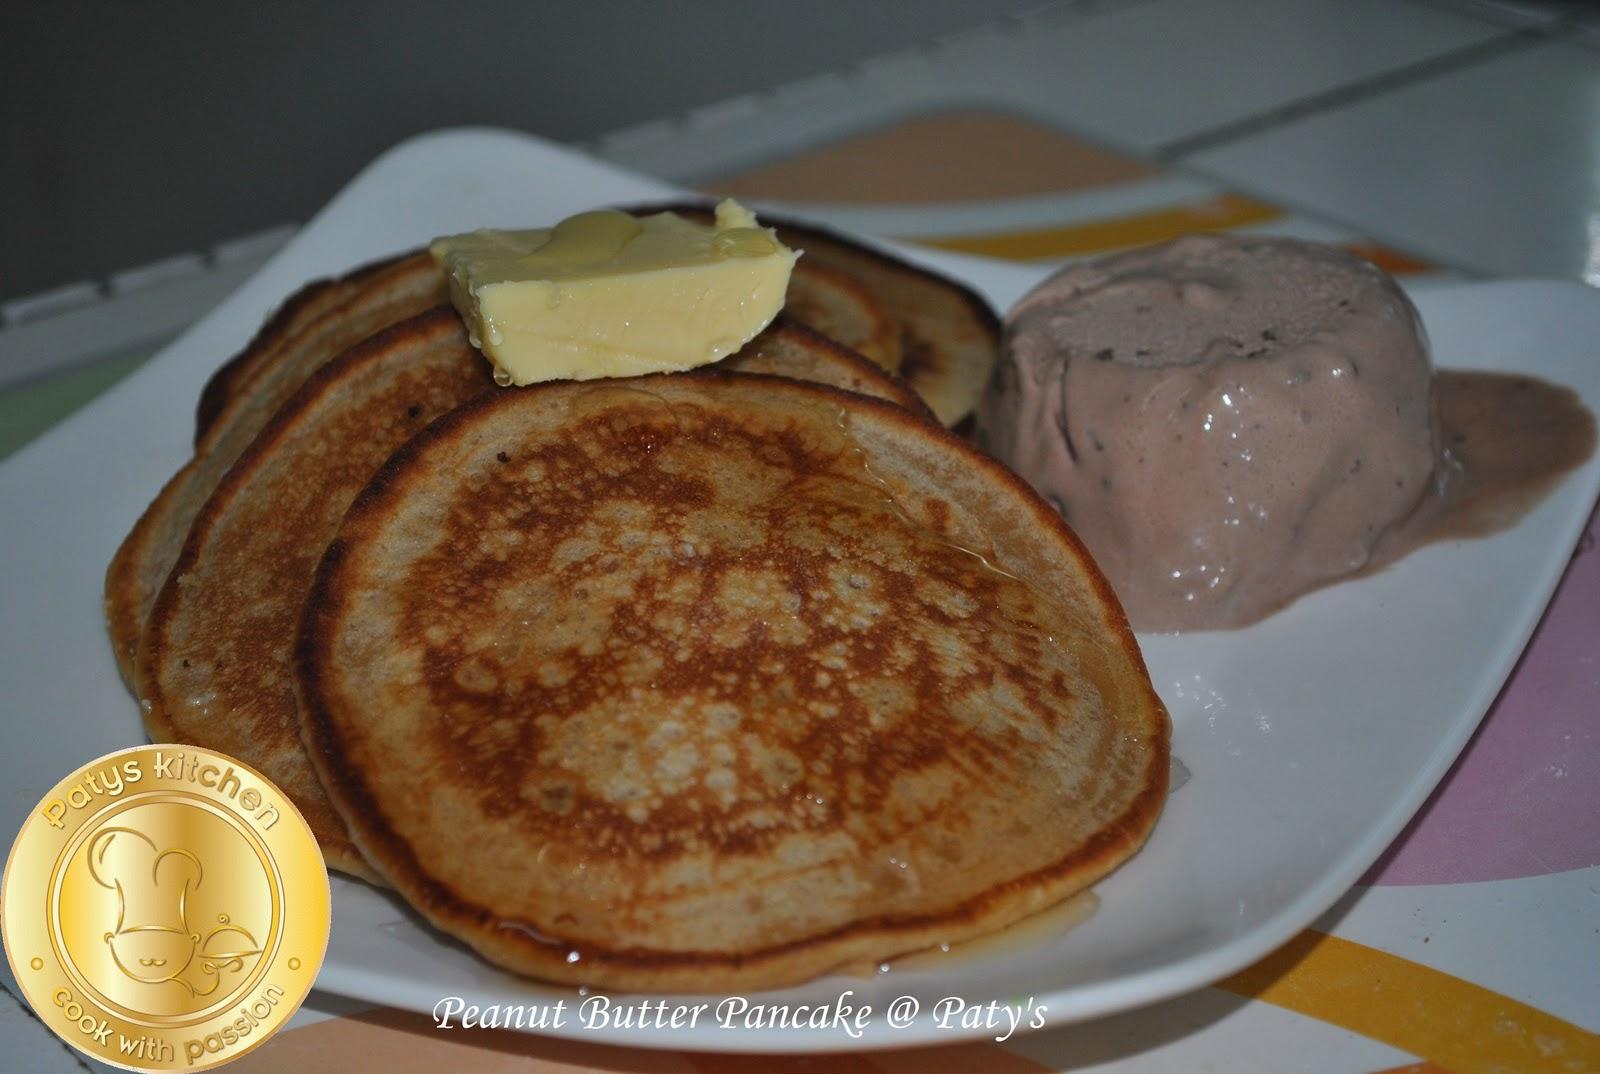 patyskitchen peanut butter pancake pancake peanut butter. Black Bedroom Furniture Sets. Home Design Ideas